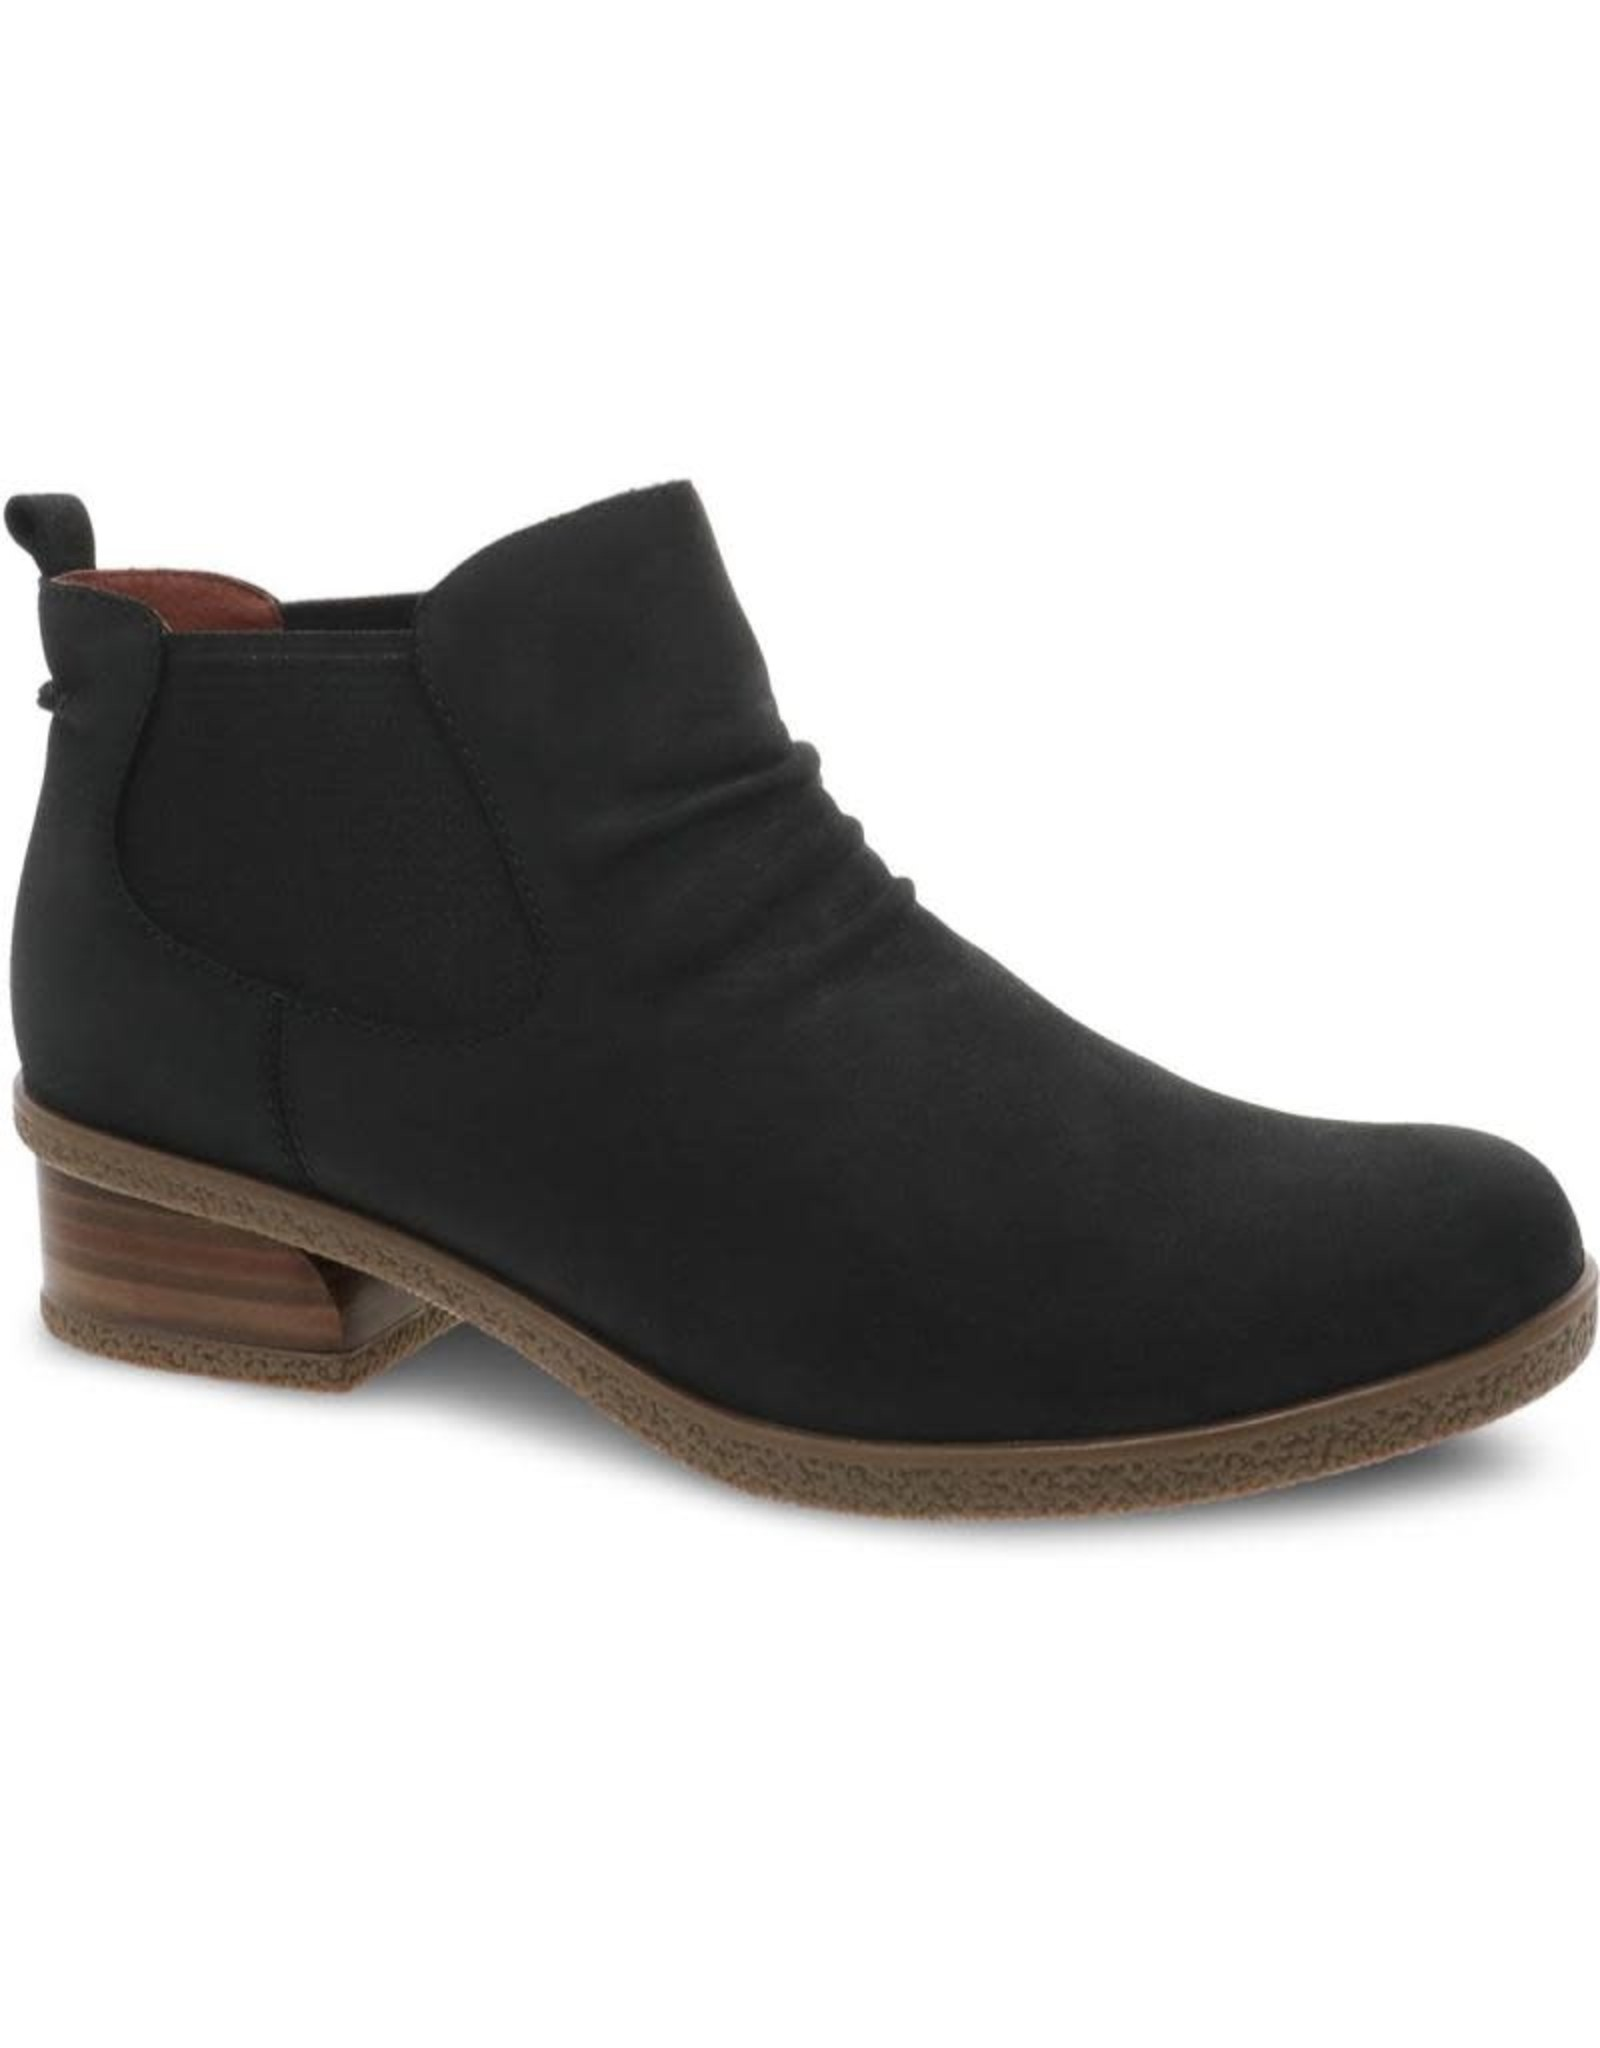 Dansko Bea Waterproof Boots